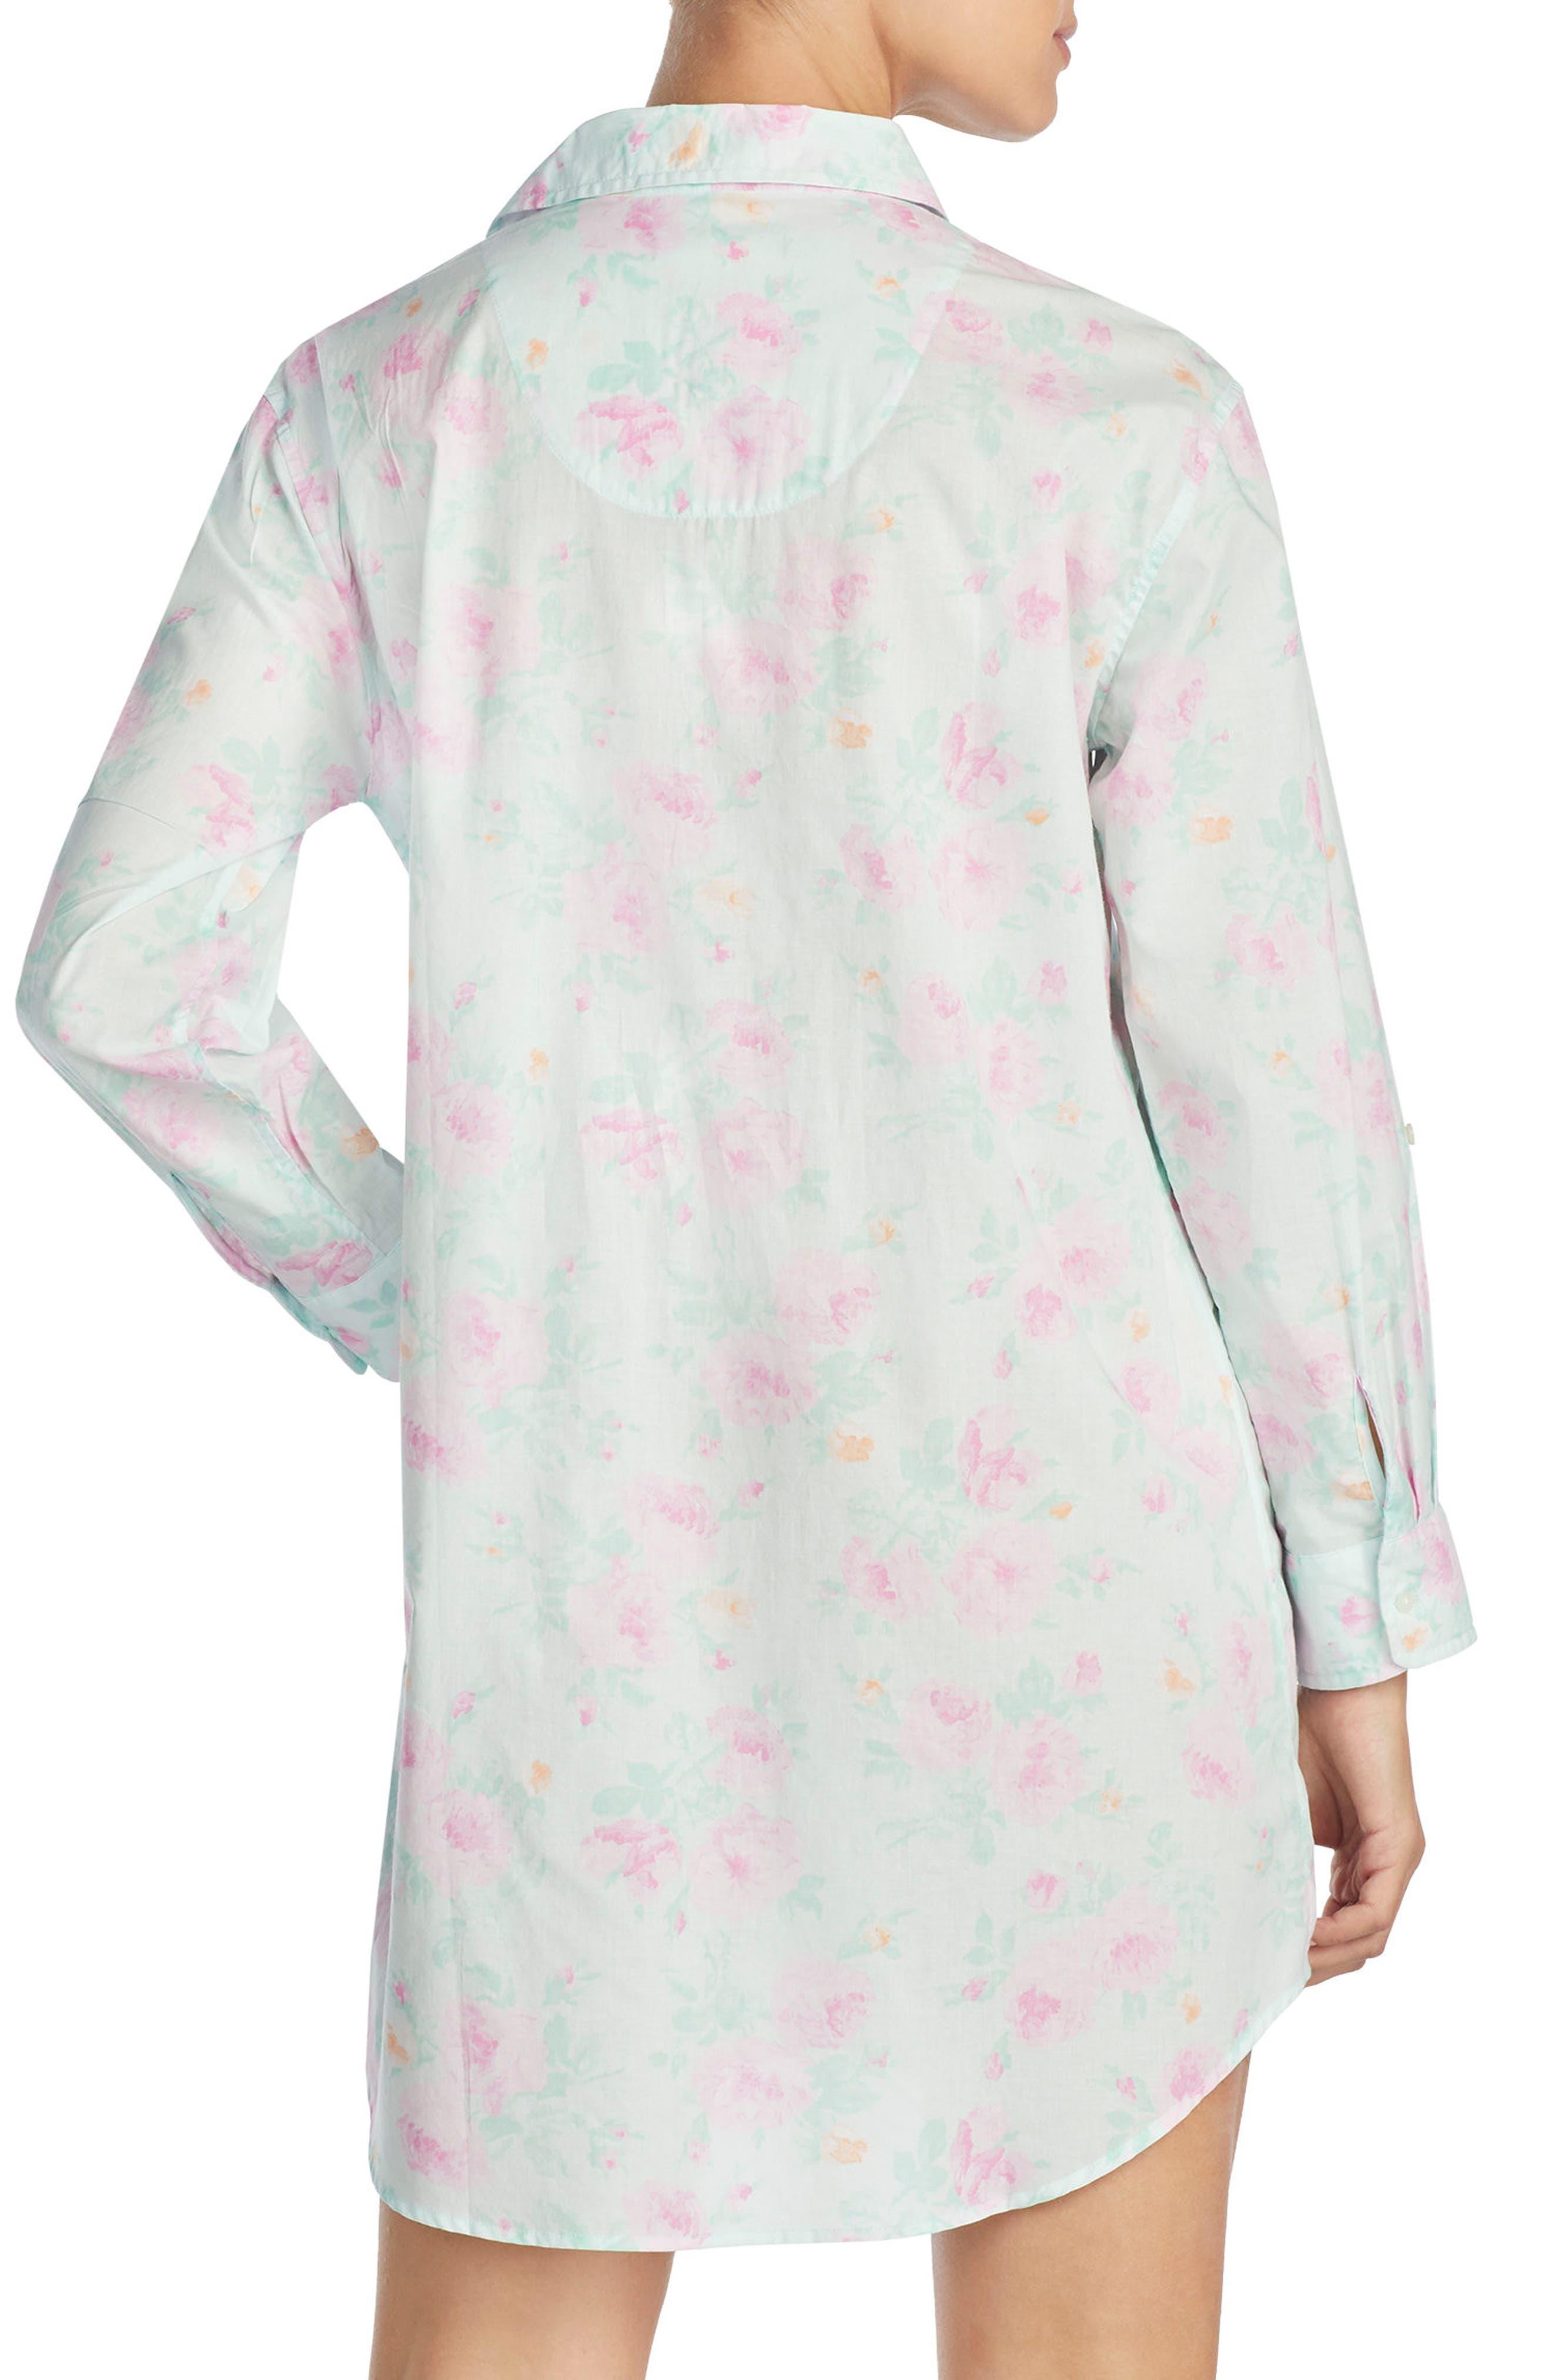 Print Sleep Shirt,                             Alternate thumbnail 2, color,                             Mint/ Pink Flower